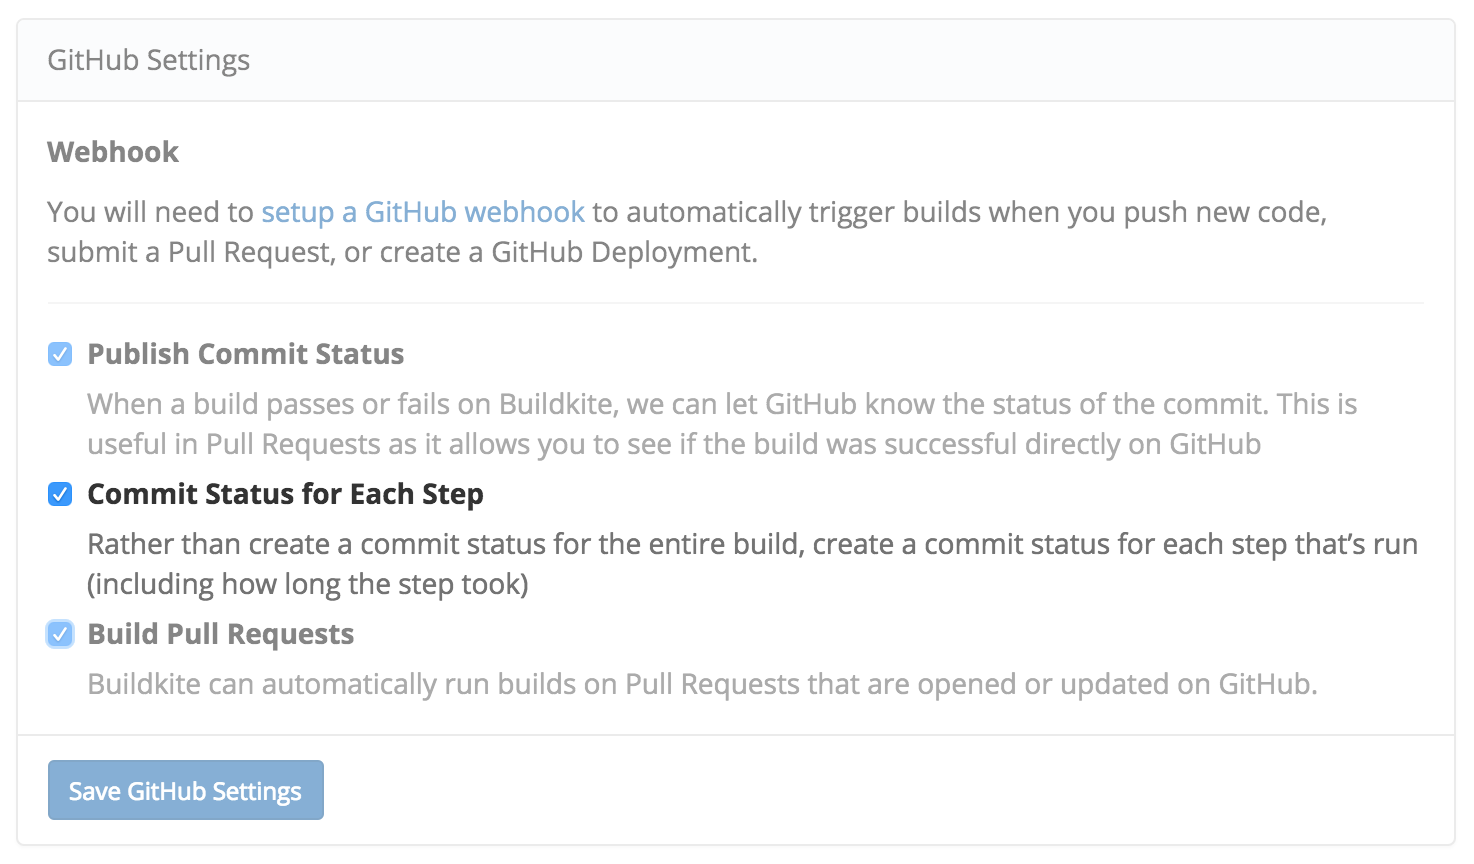 Per-Step GitHub Commit Statuses